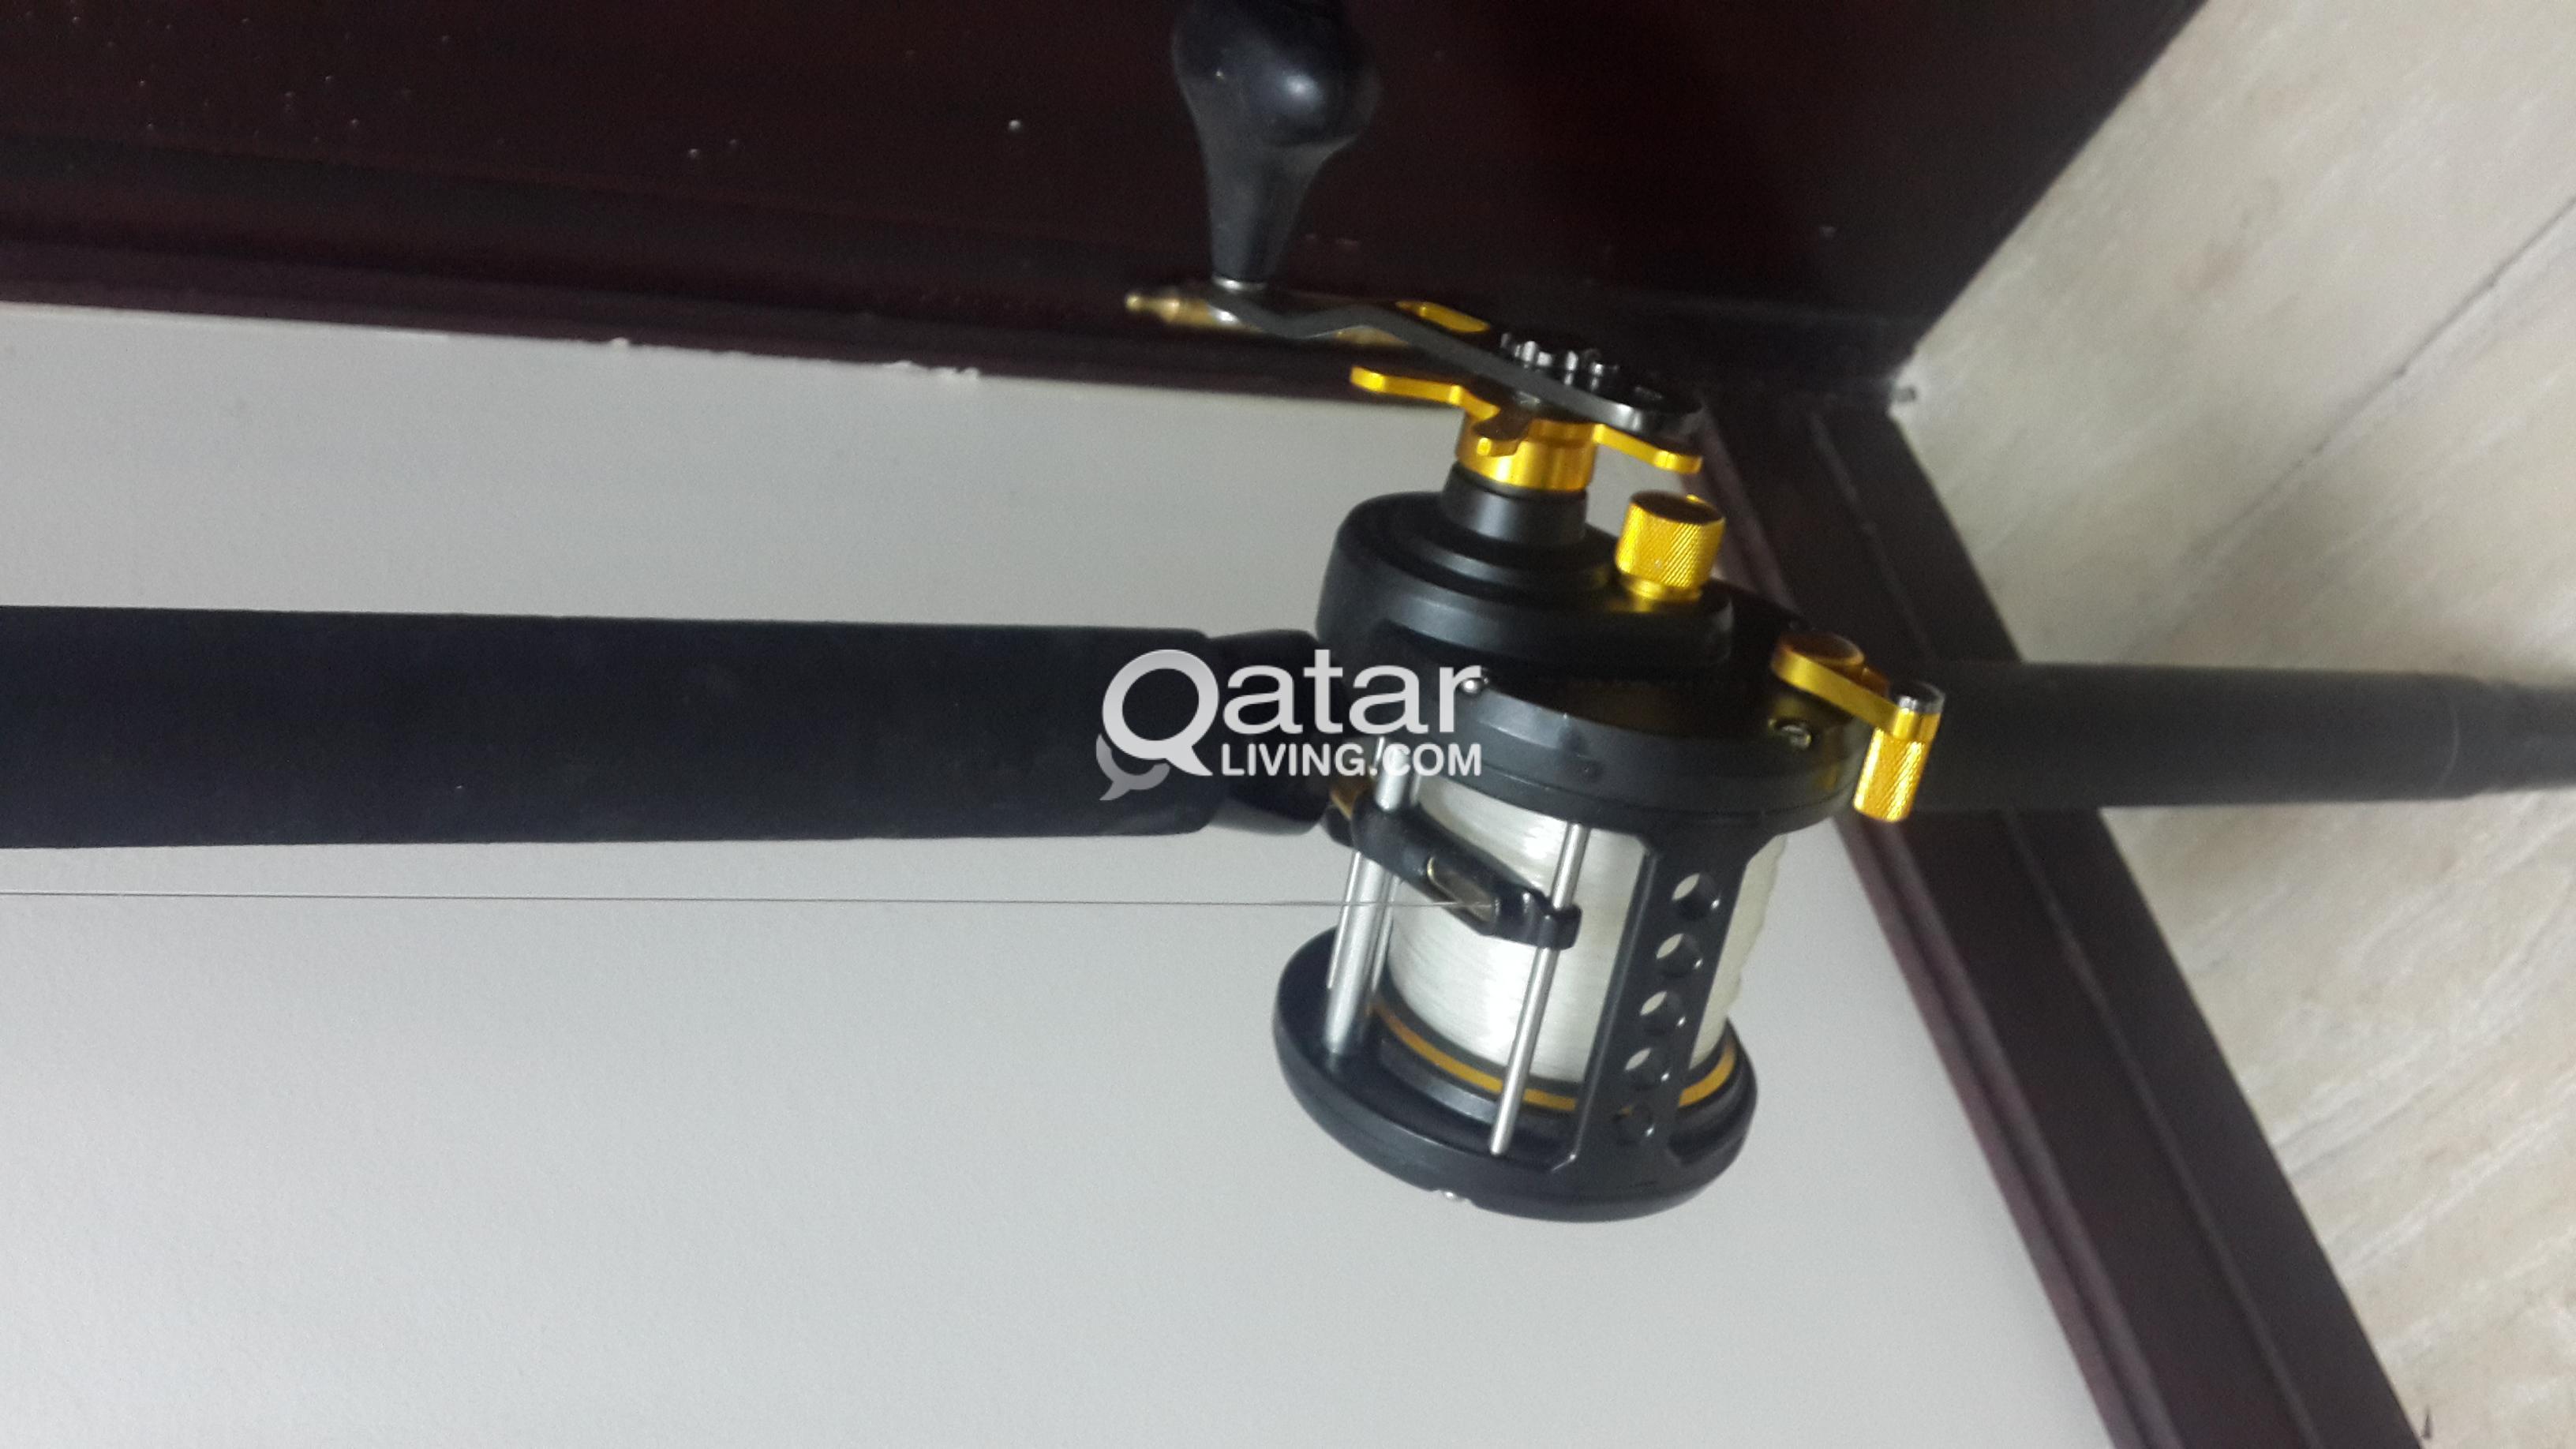 Fishing Rods Amp Reels Qatar Living